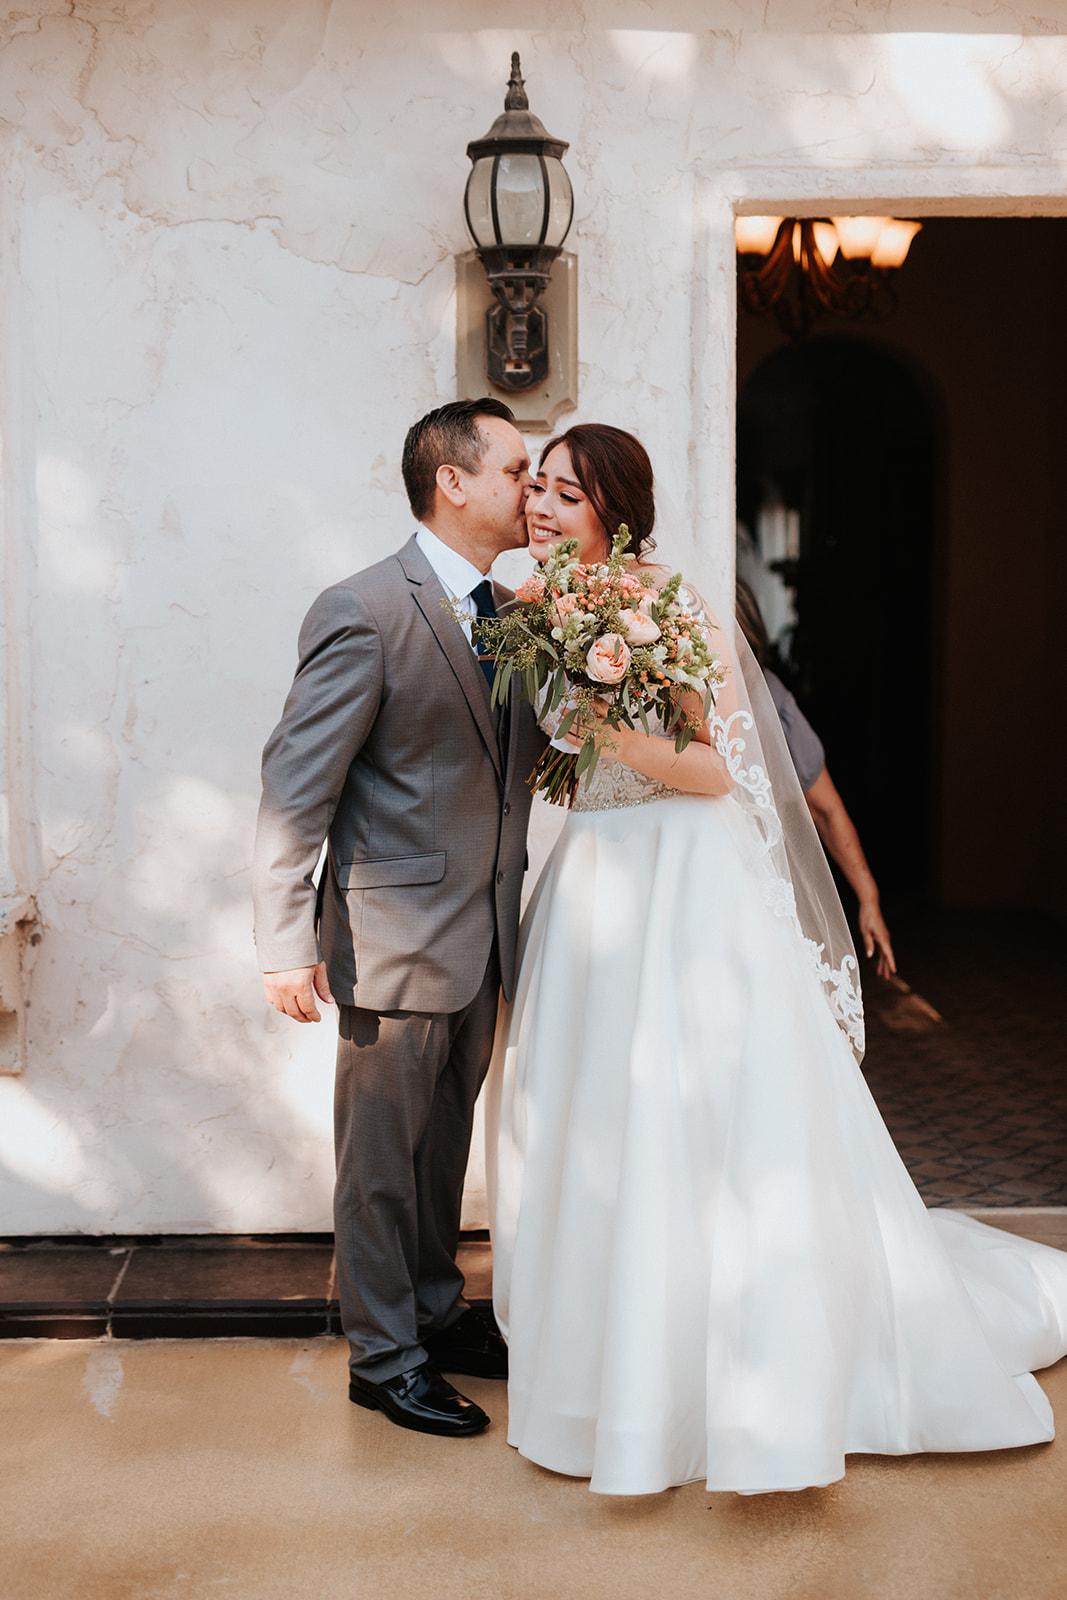 Jessica_+_JD_Wedding_-_Diana_Ascarrunz_Photography-336.jpg